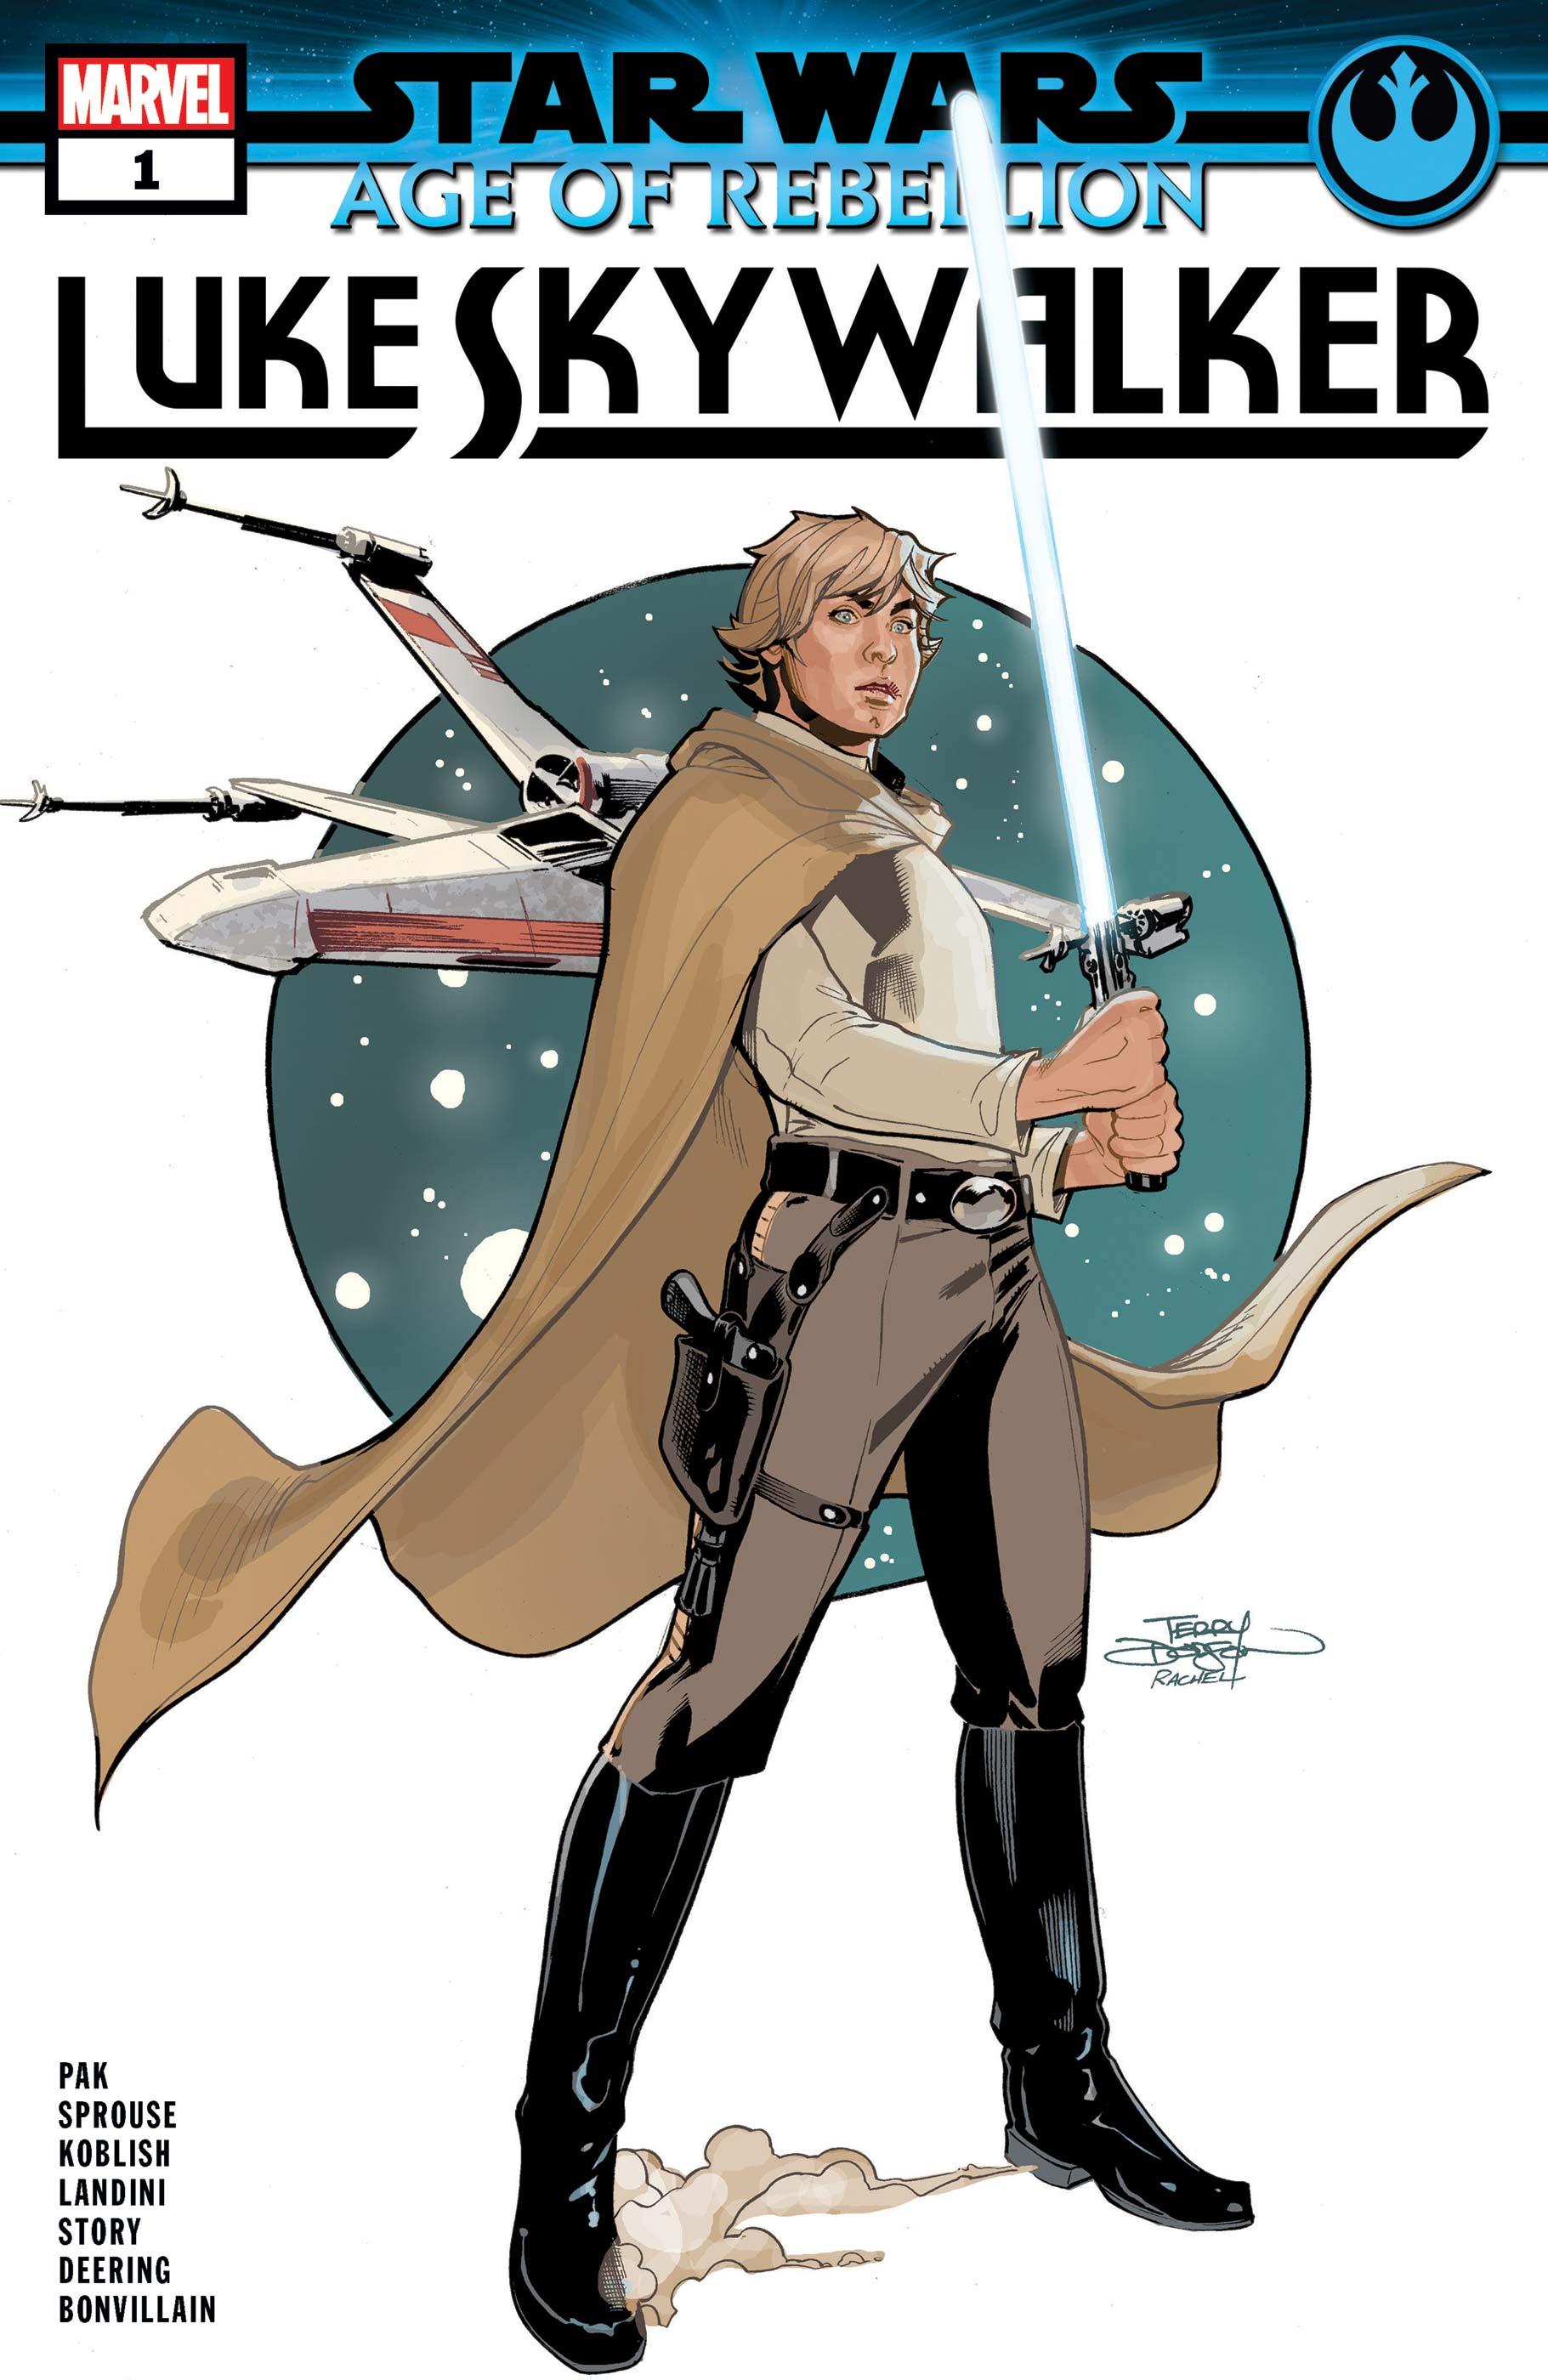 Star Wars Age of Rebellion: Fight or Flight